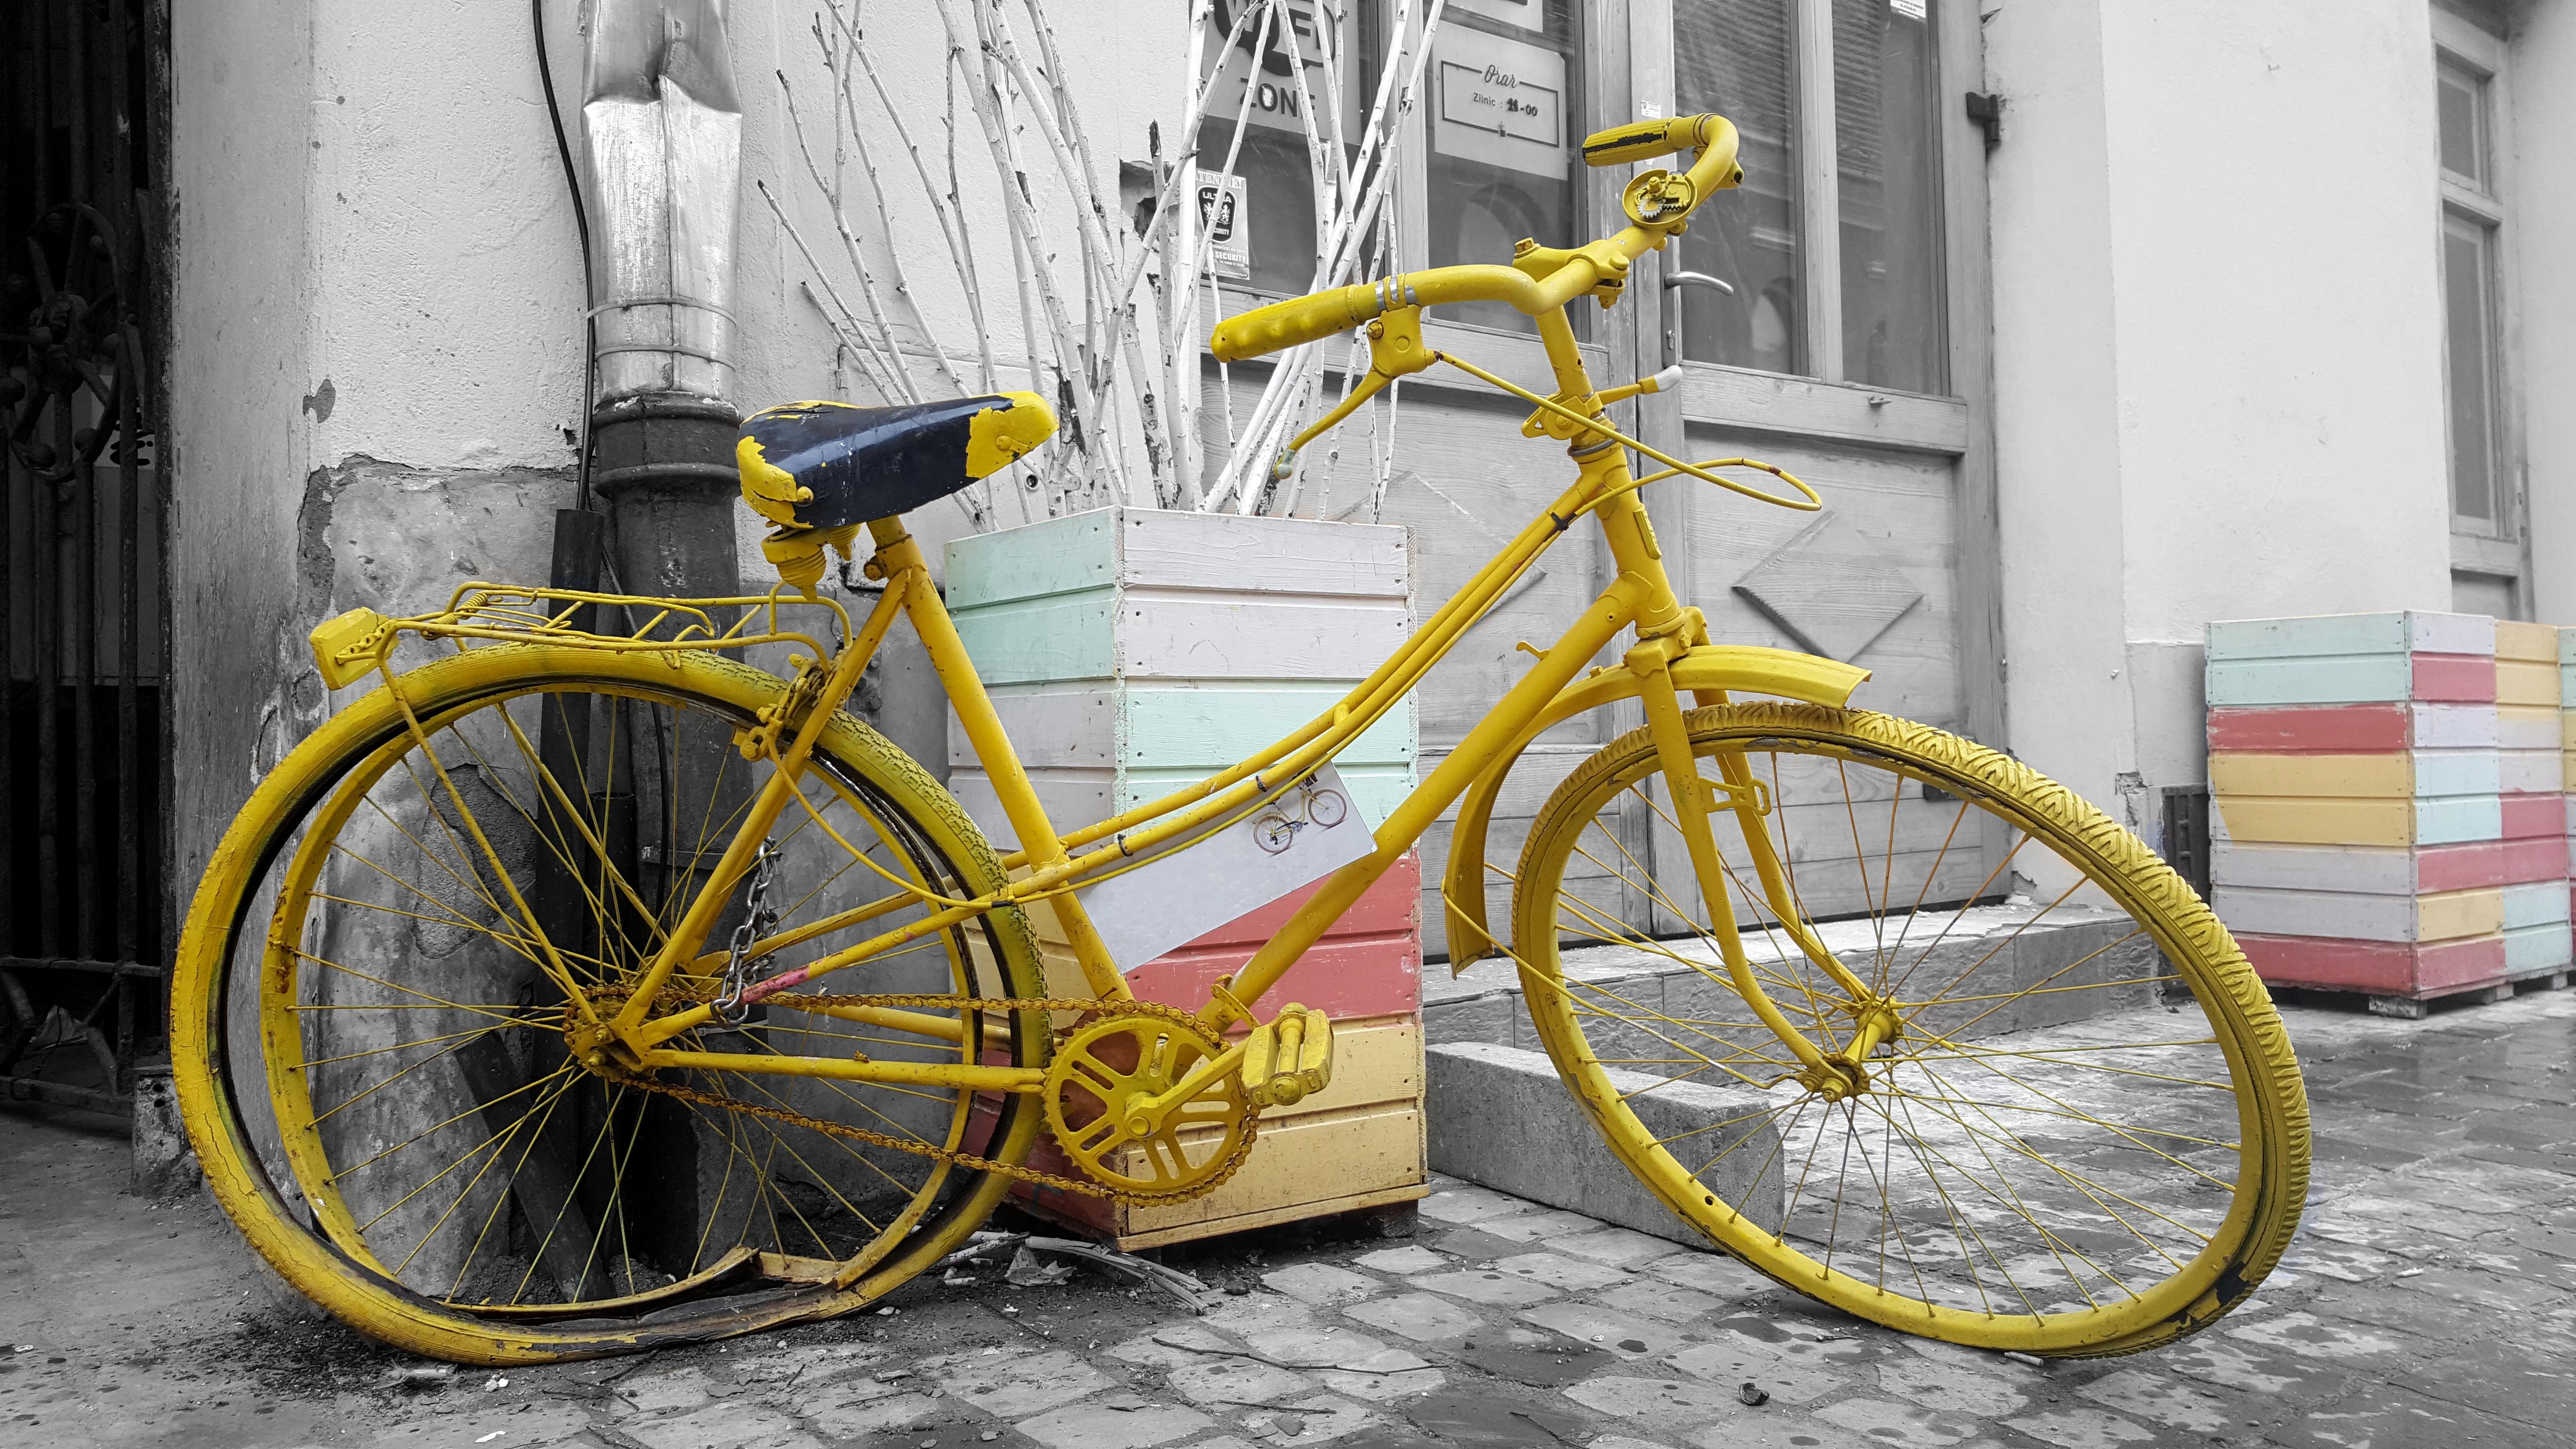 Free Images : black and white, wheel, retro, parking, city, urban ...